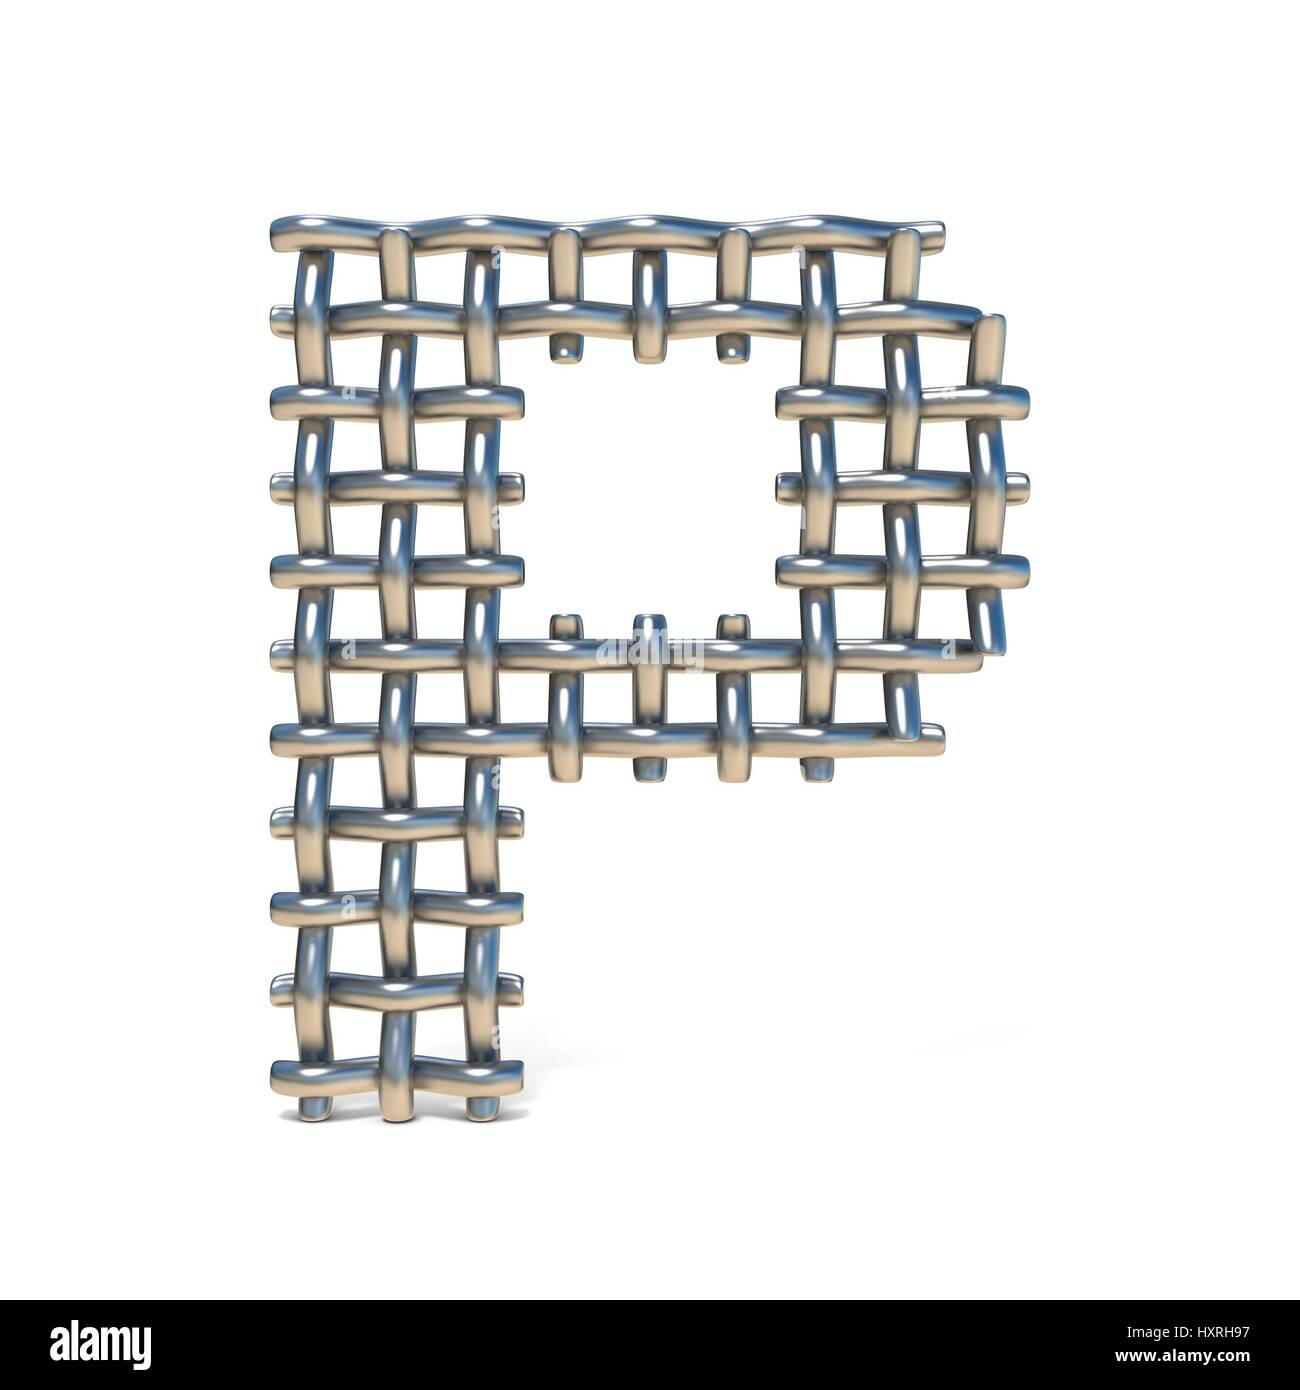 Silver Steel Wire Font Letter Stockfotos & Silver Steel Wire Font ...